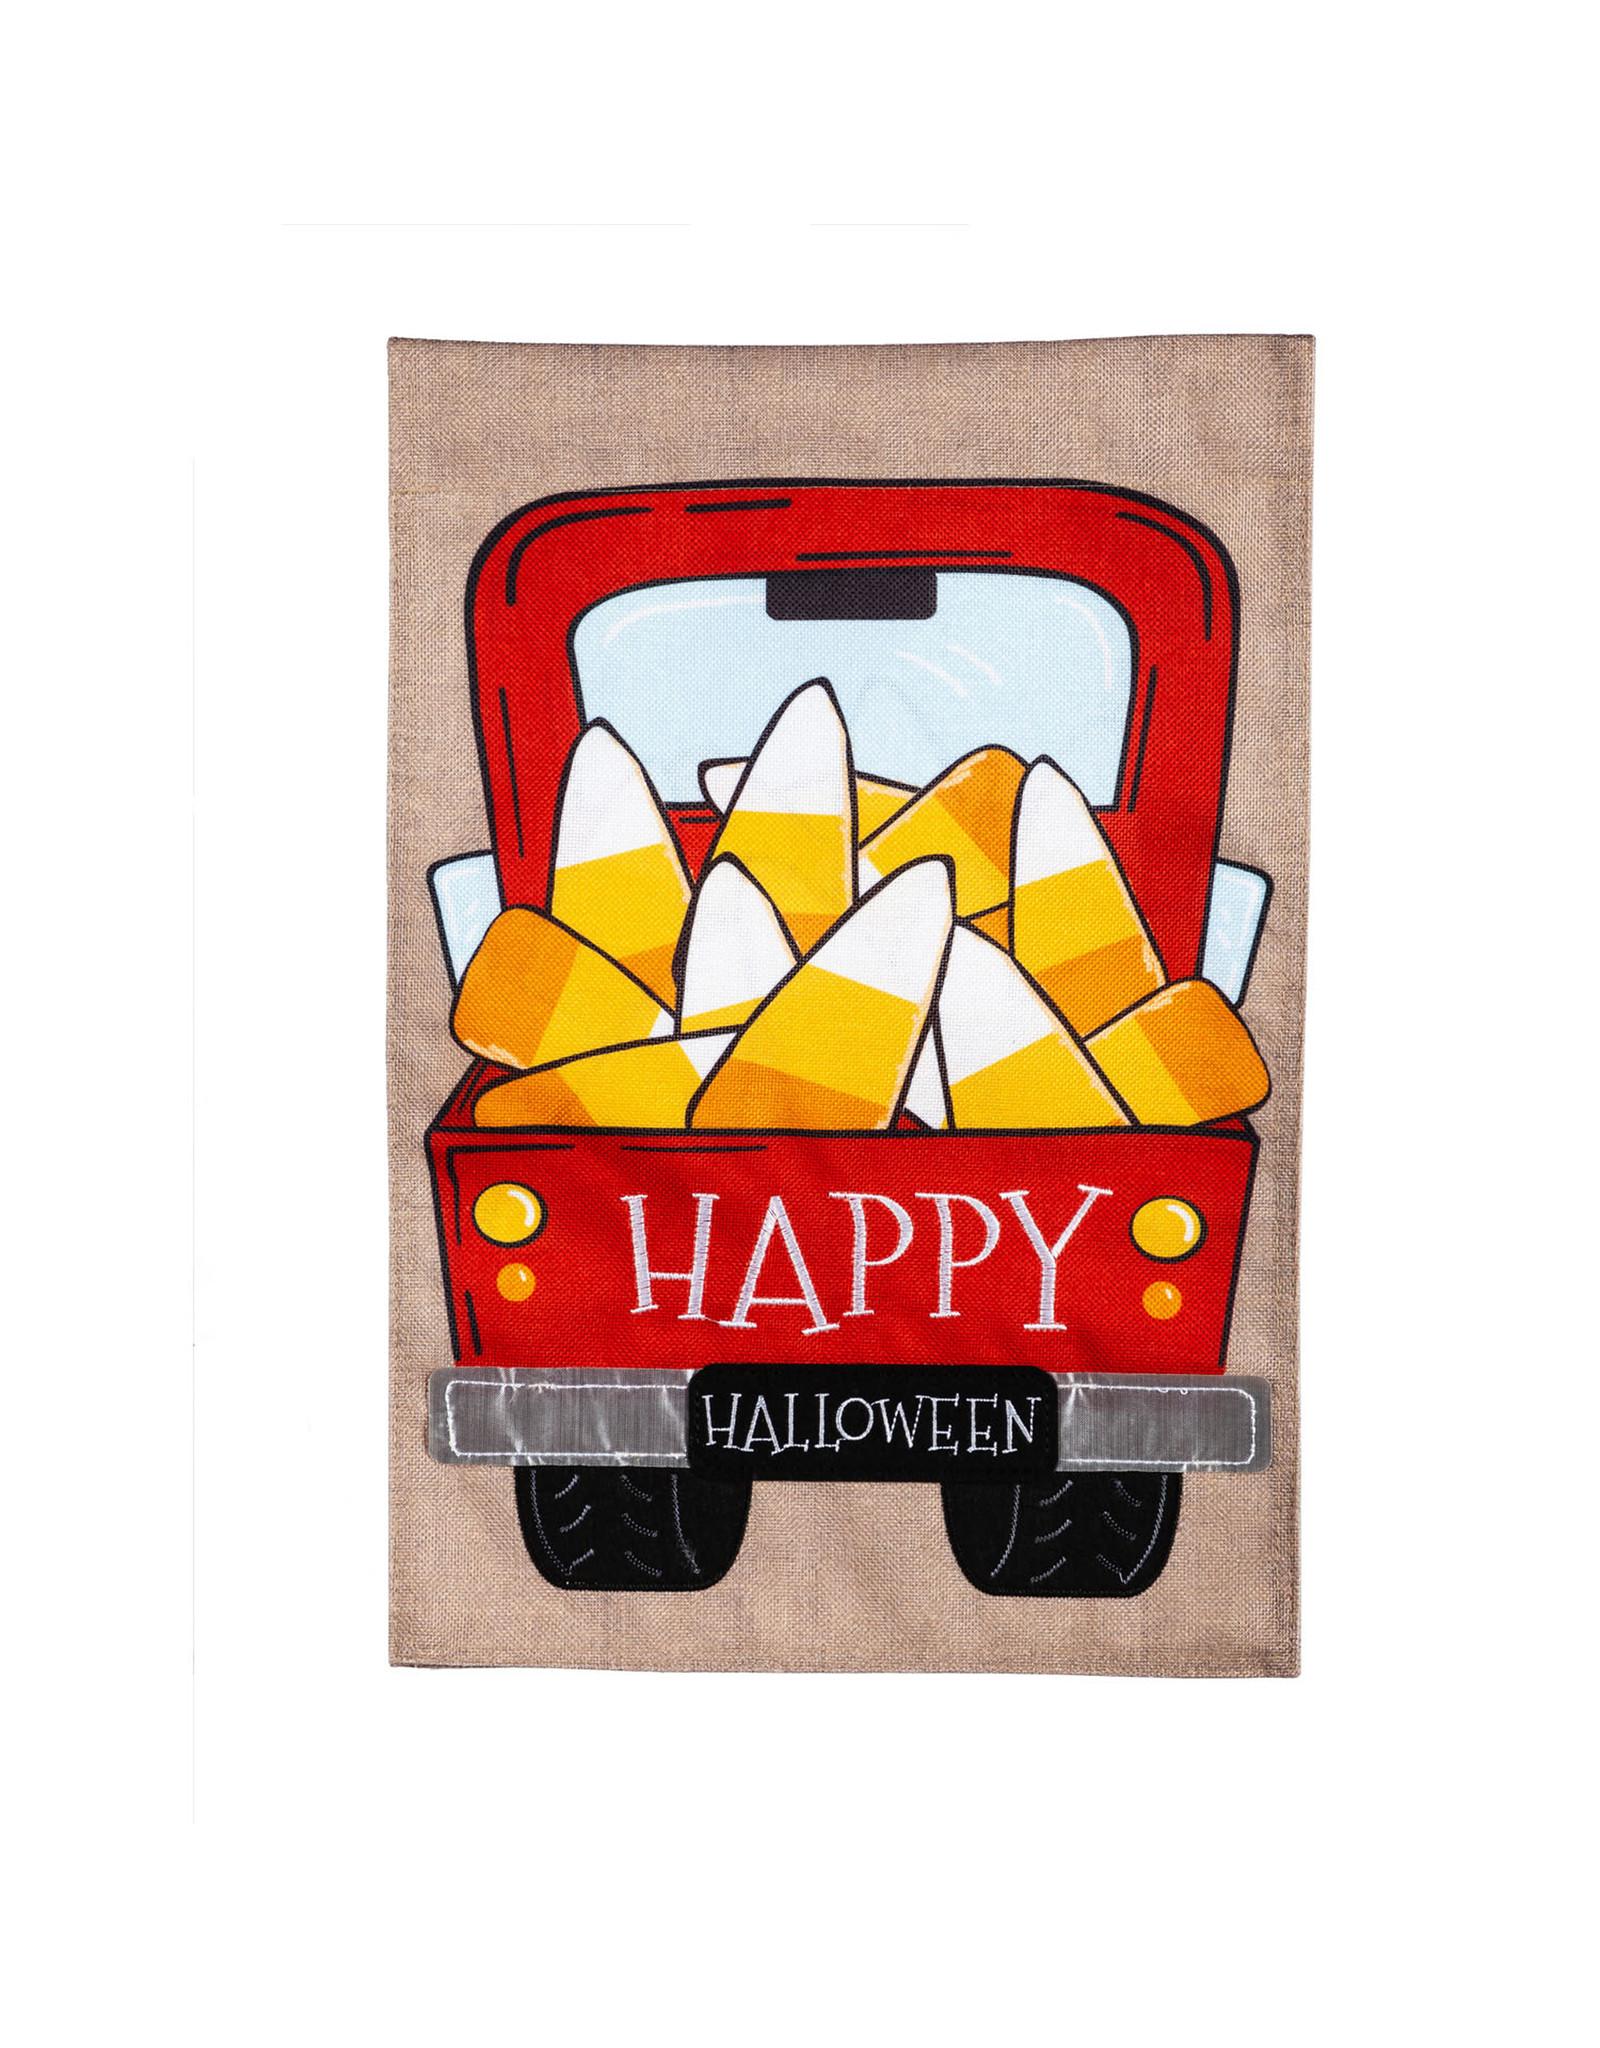 Evergreen Enterprises Candy Corn Truck House Burlap Flag 28 x 44